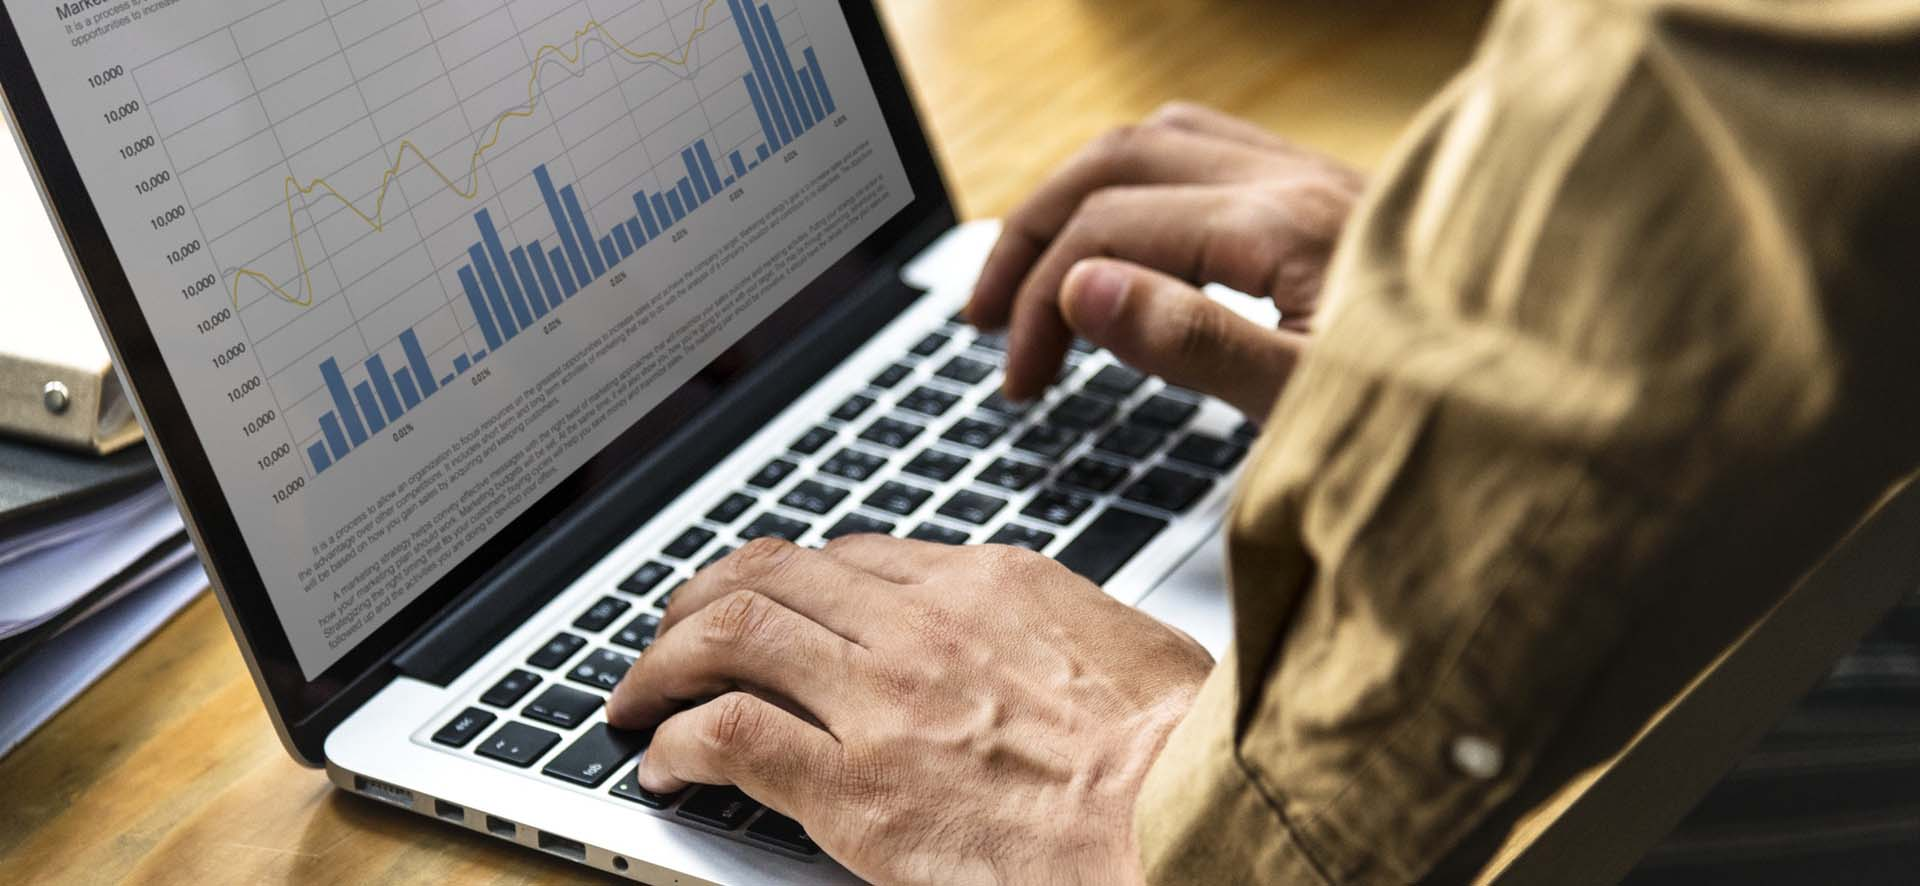 Tendencias tecnológicas para empresas